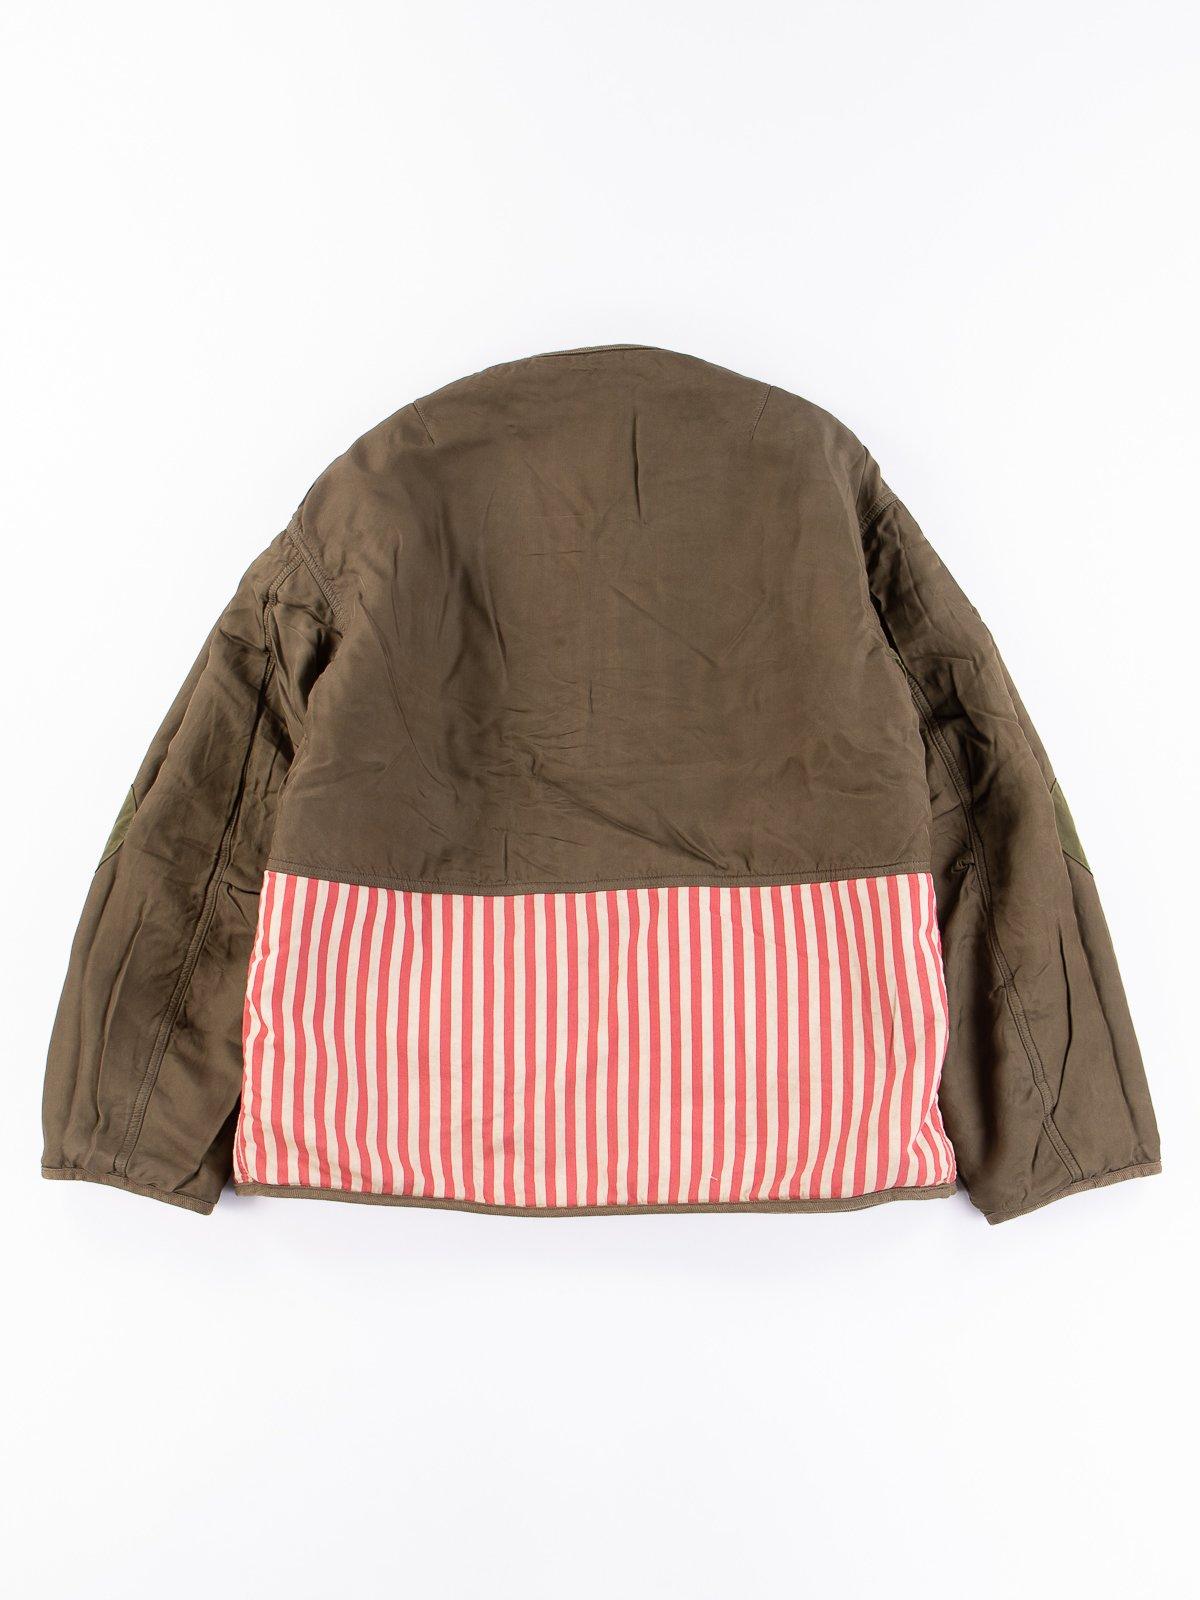 Olive Iris Liner Jacket - Image 8